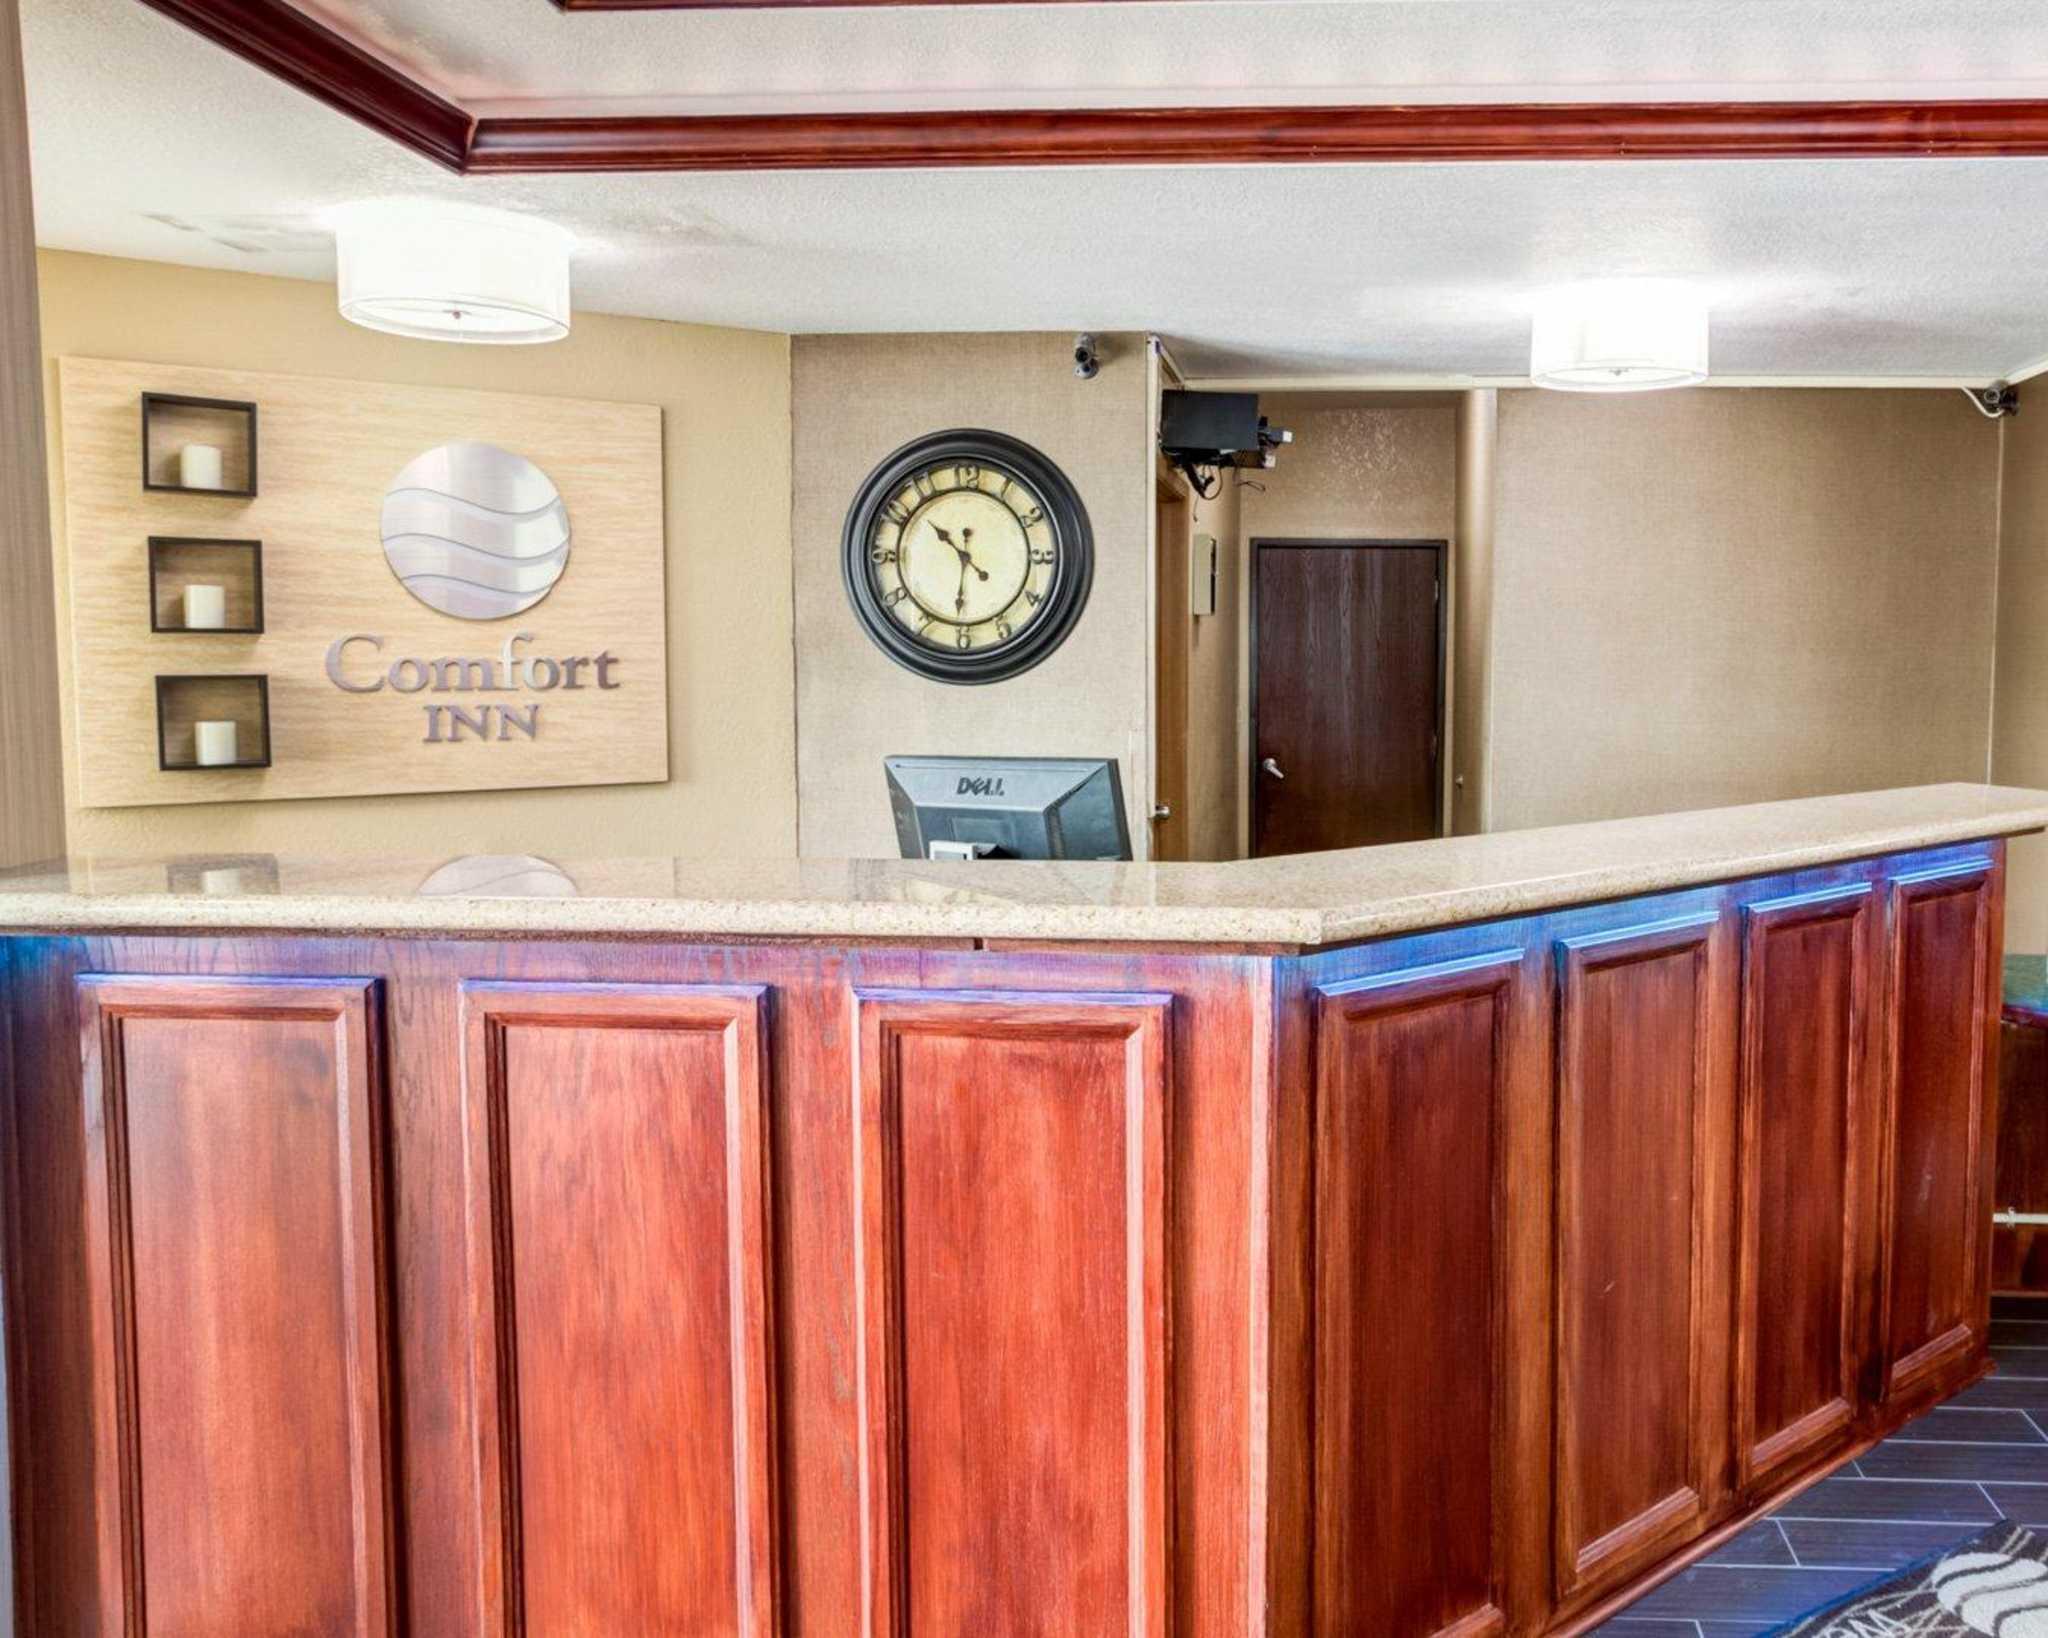 Comfort Inn Kearney - Liberty image 10